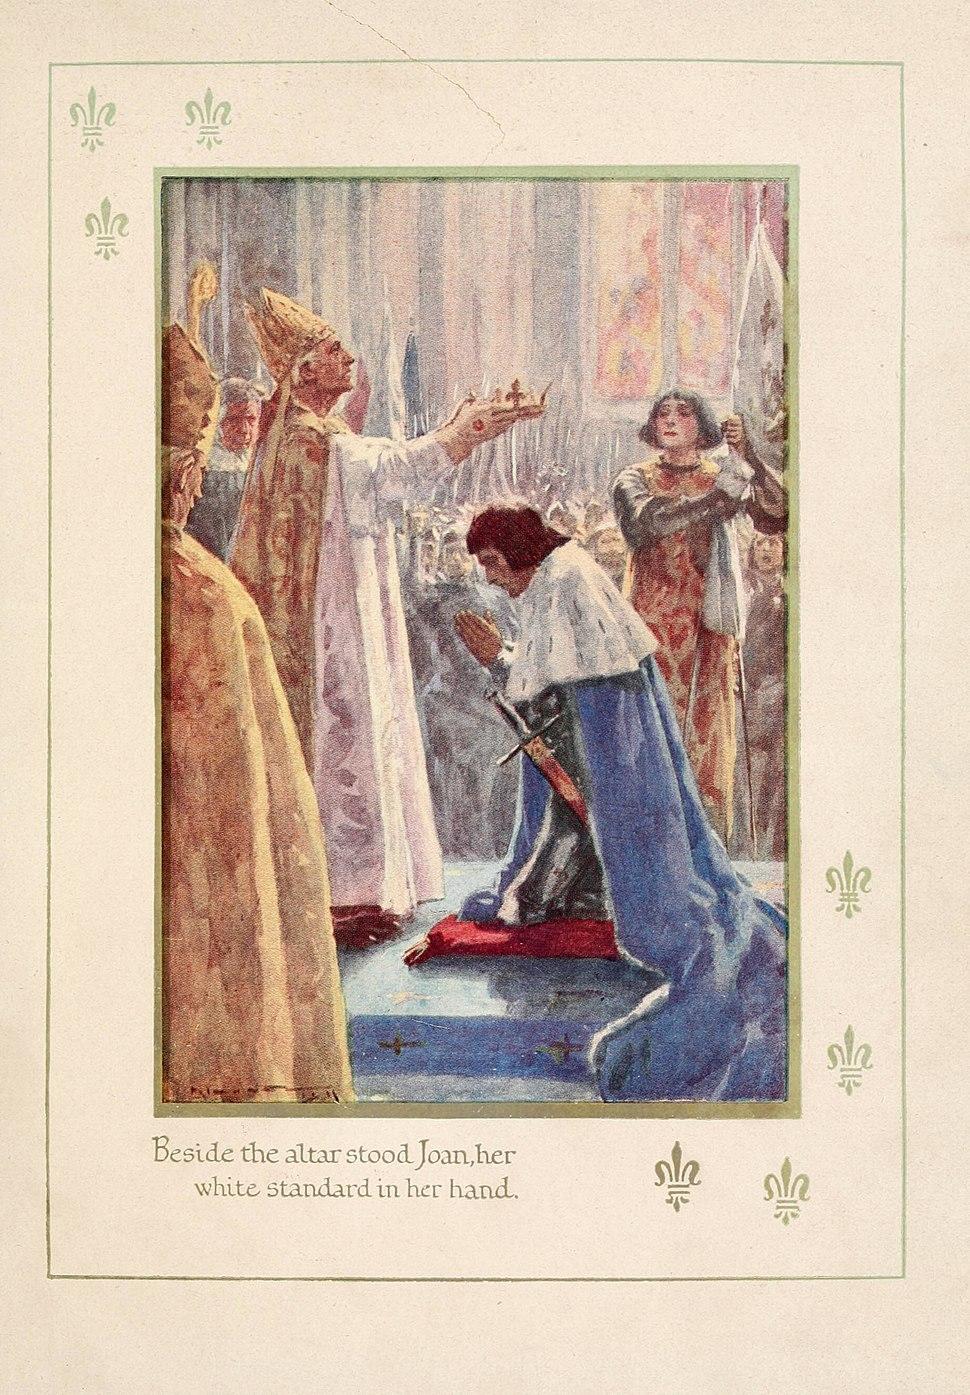 Beside the altar stood Joan, her whit standard in her hand